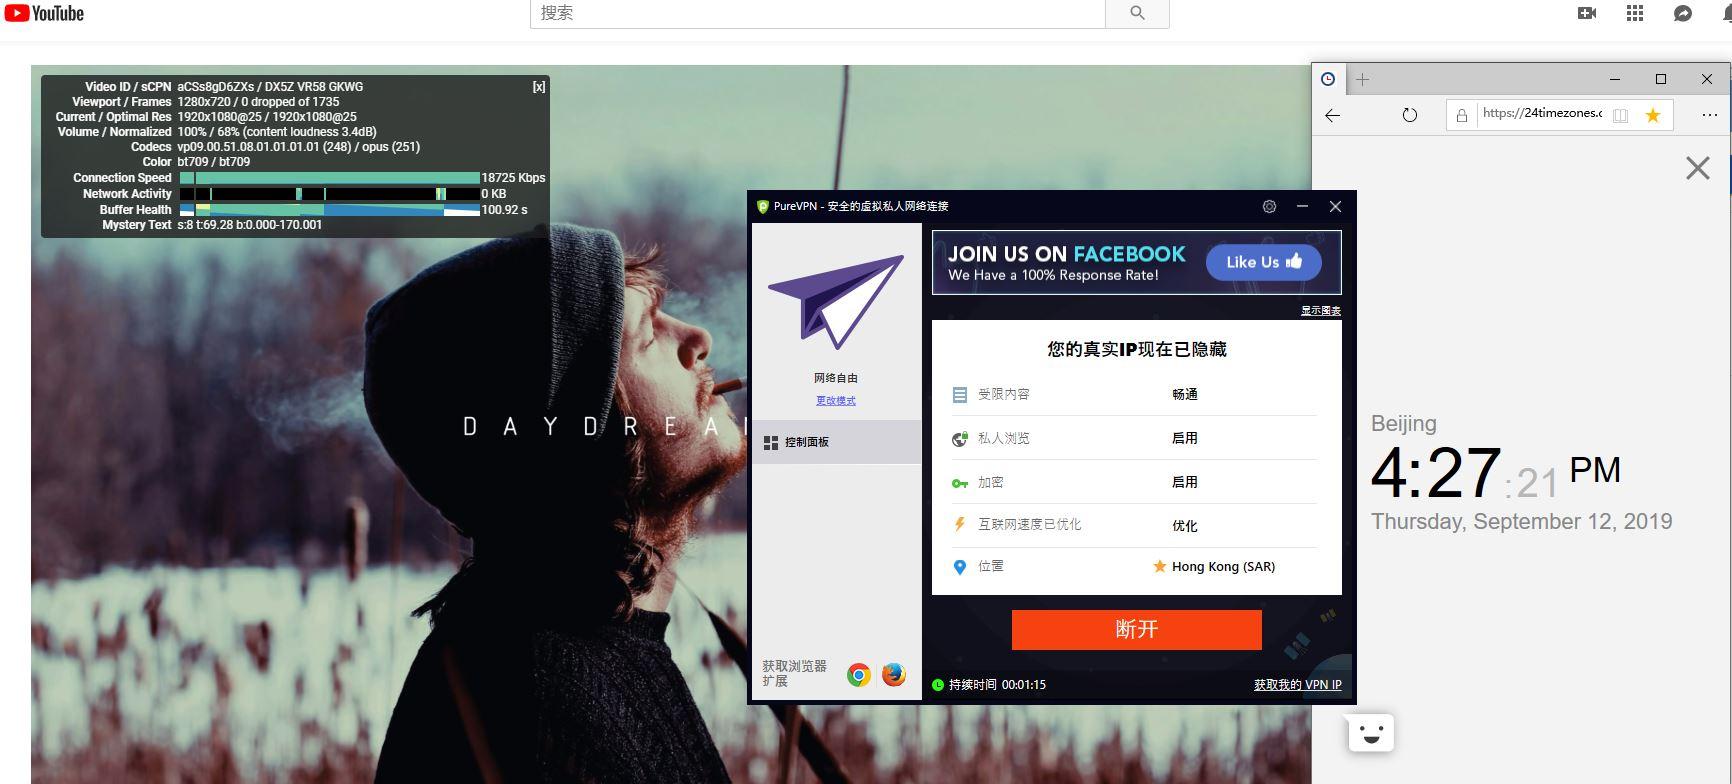 window10 PureVPN Hong Kong 服务器 中国VPN翻墙 科学上网-20190912